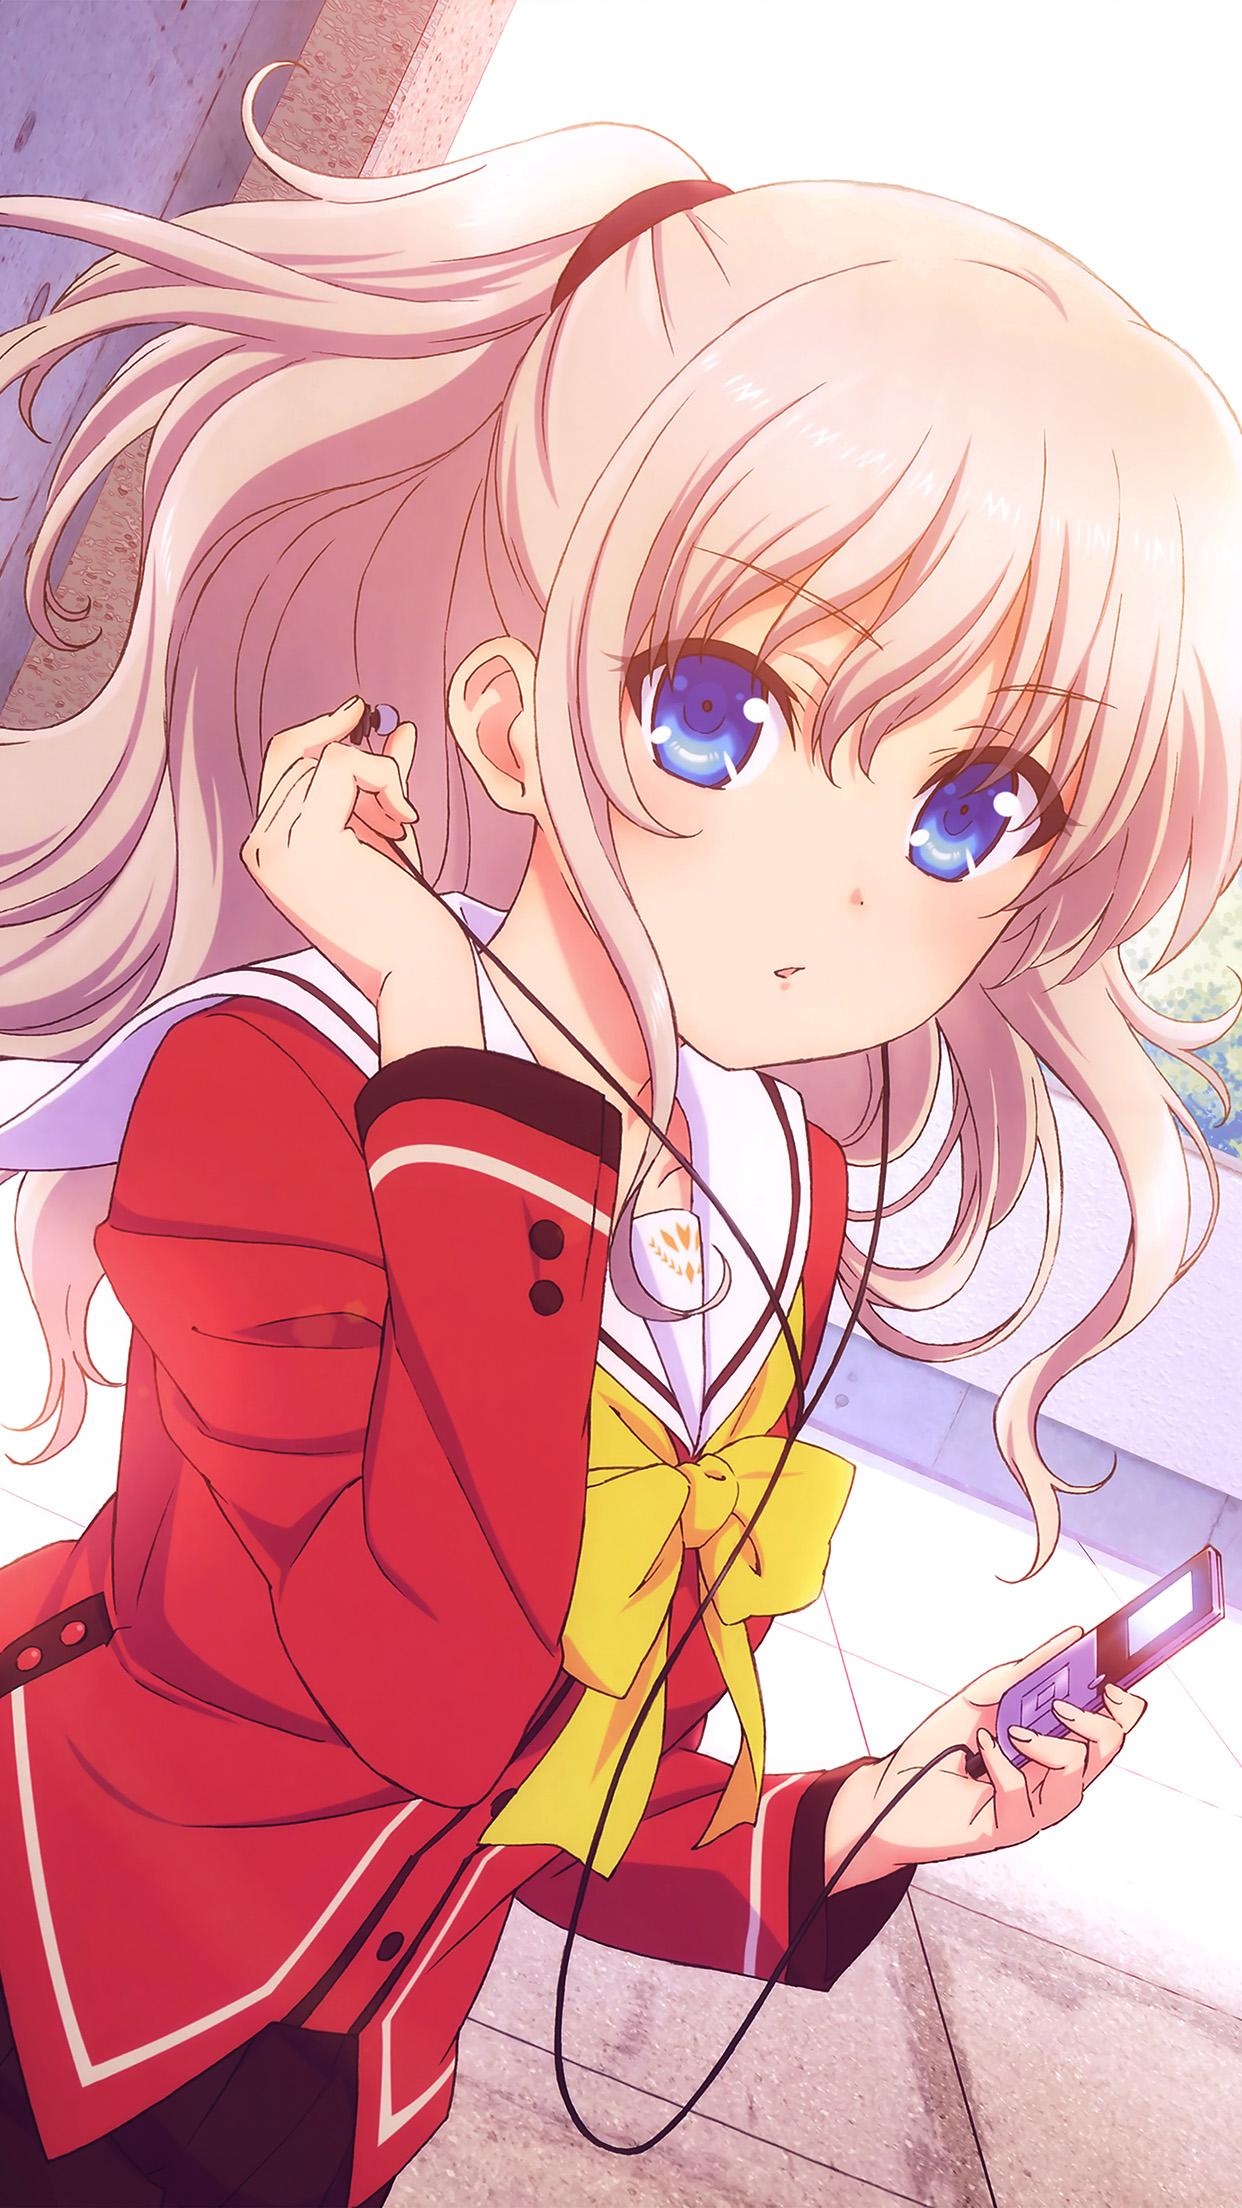 Anime Girl Cute Wallpaper Hd - 10x10 - Download HD Wallpaper